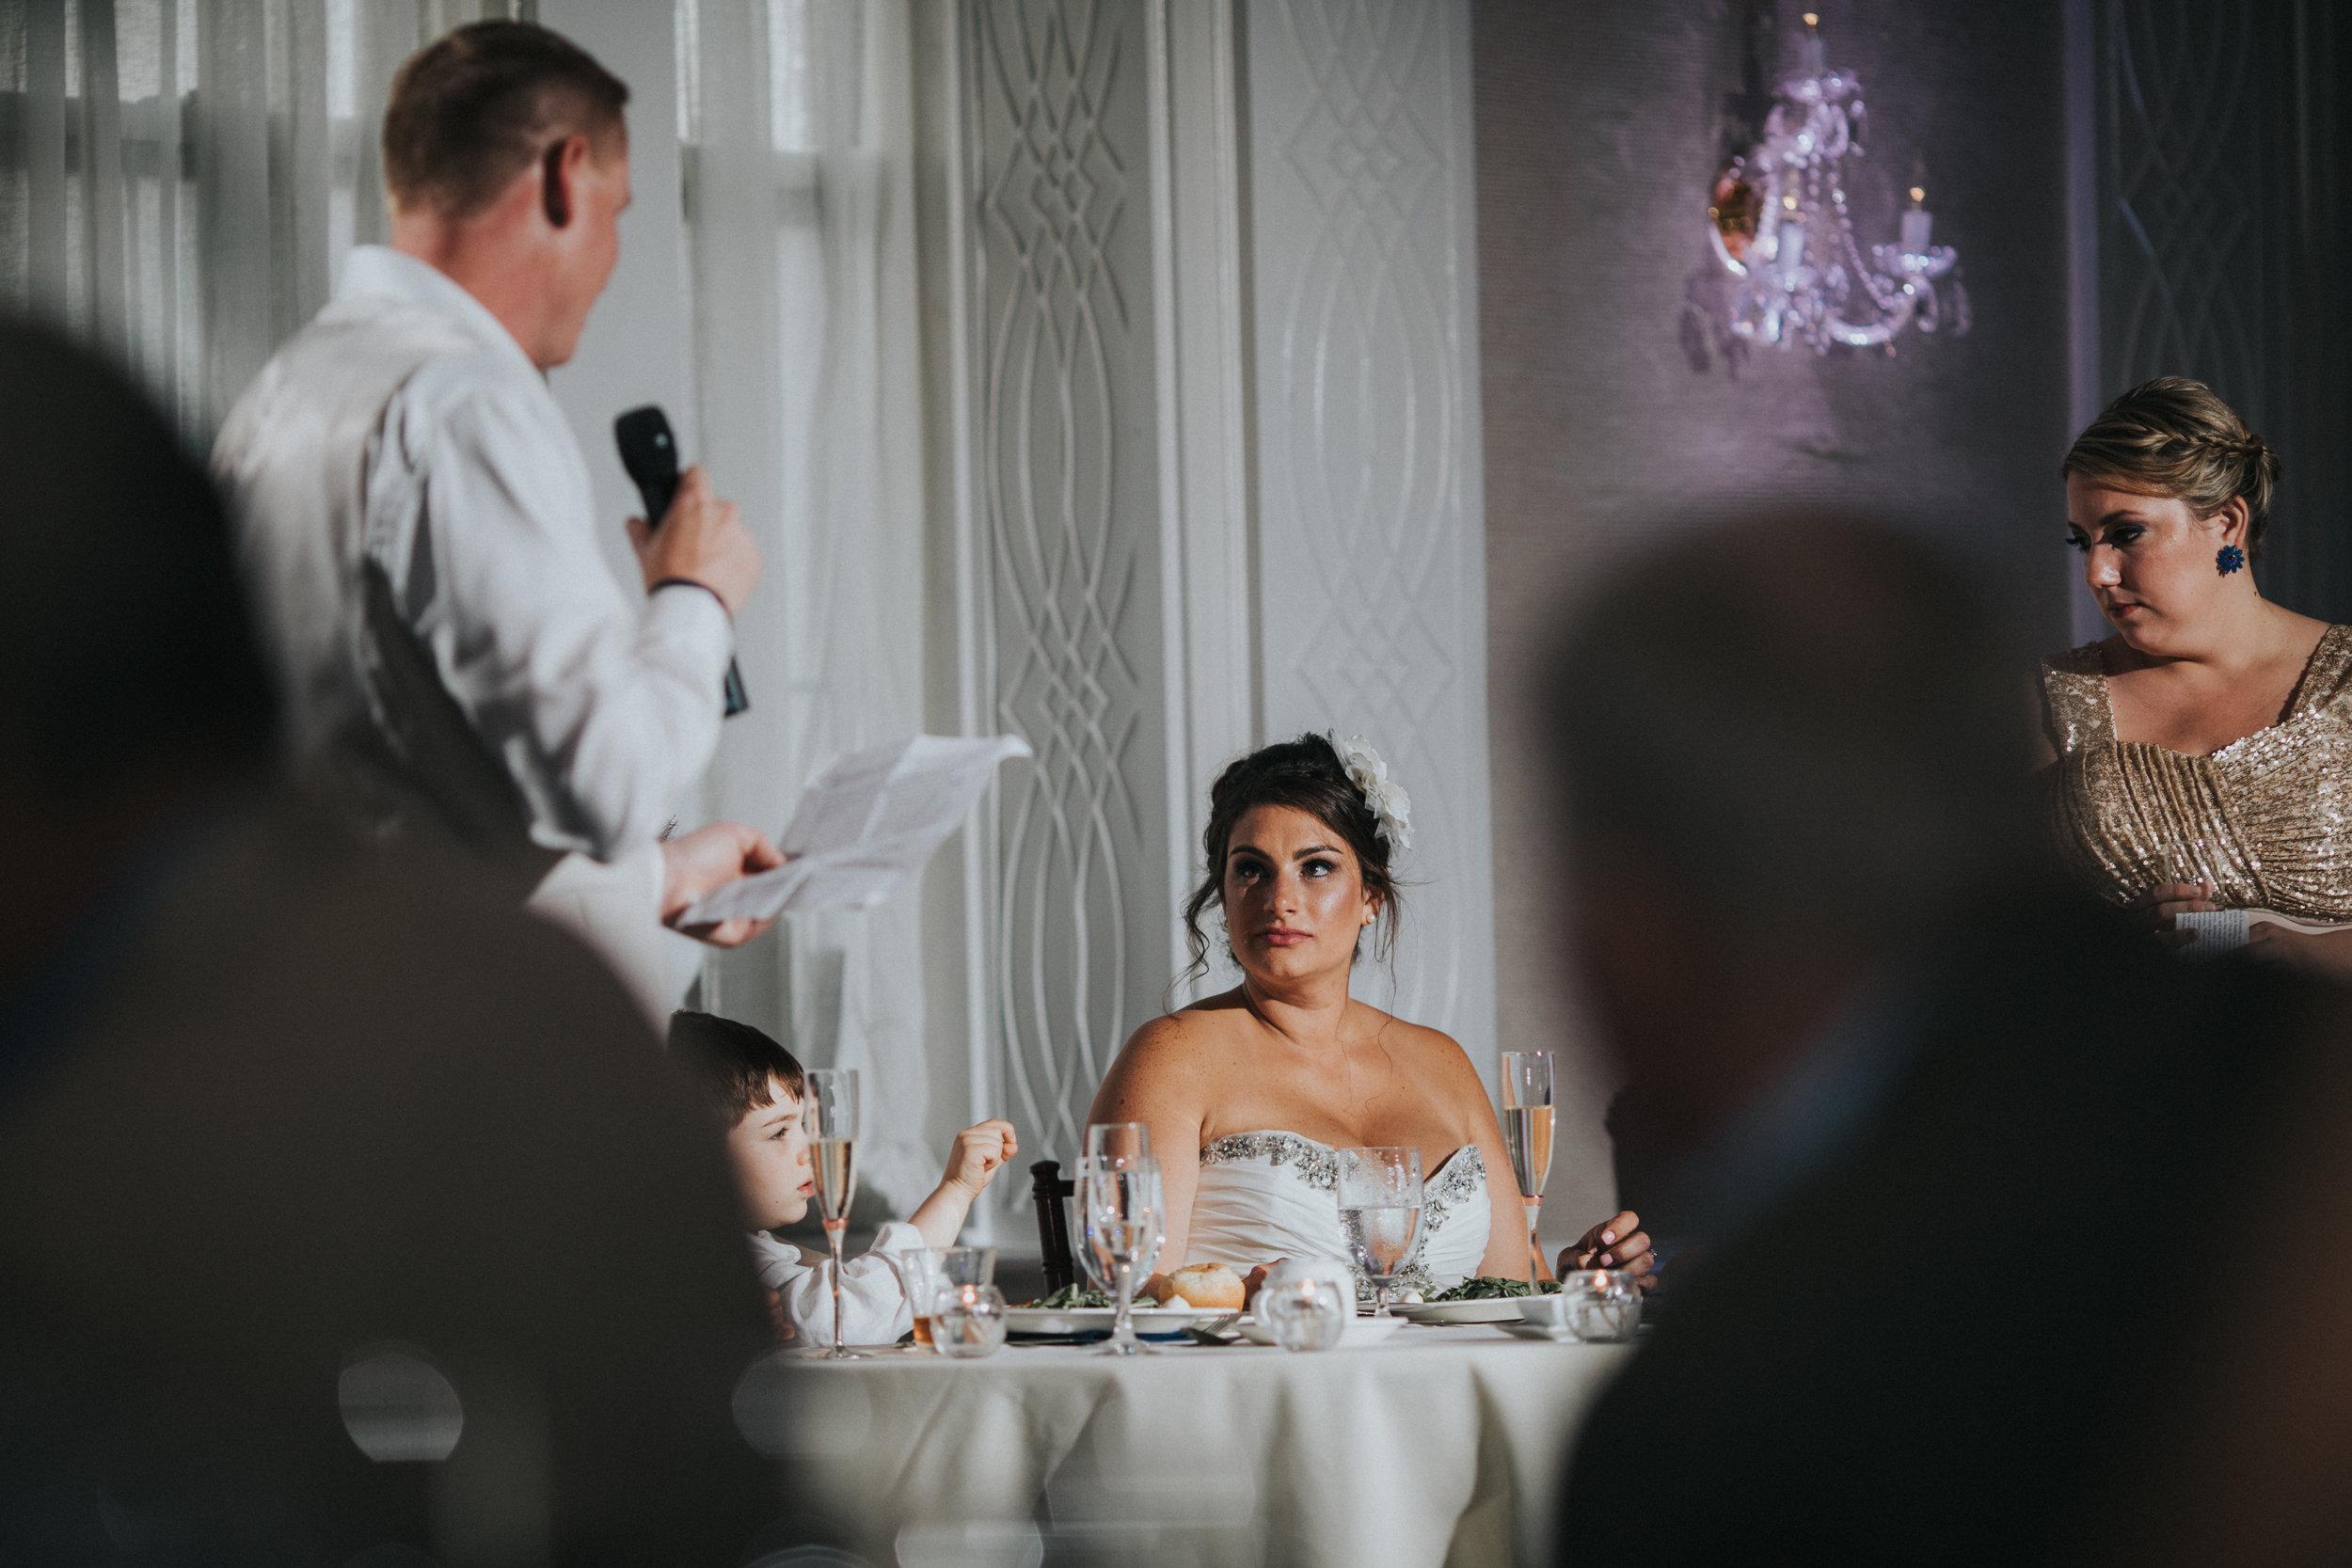 JennaLynnPhotography-NJWeddingPhotographer-Wedding-TheBerkeley-AsburyPark-Allison&Michael-Reception-54.jpg